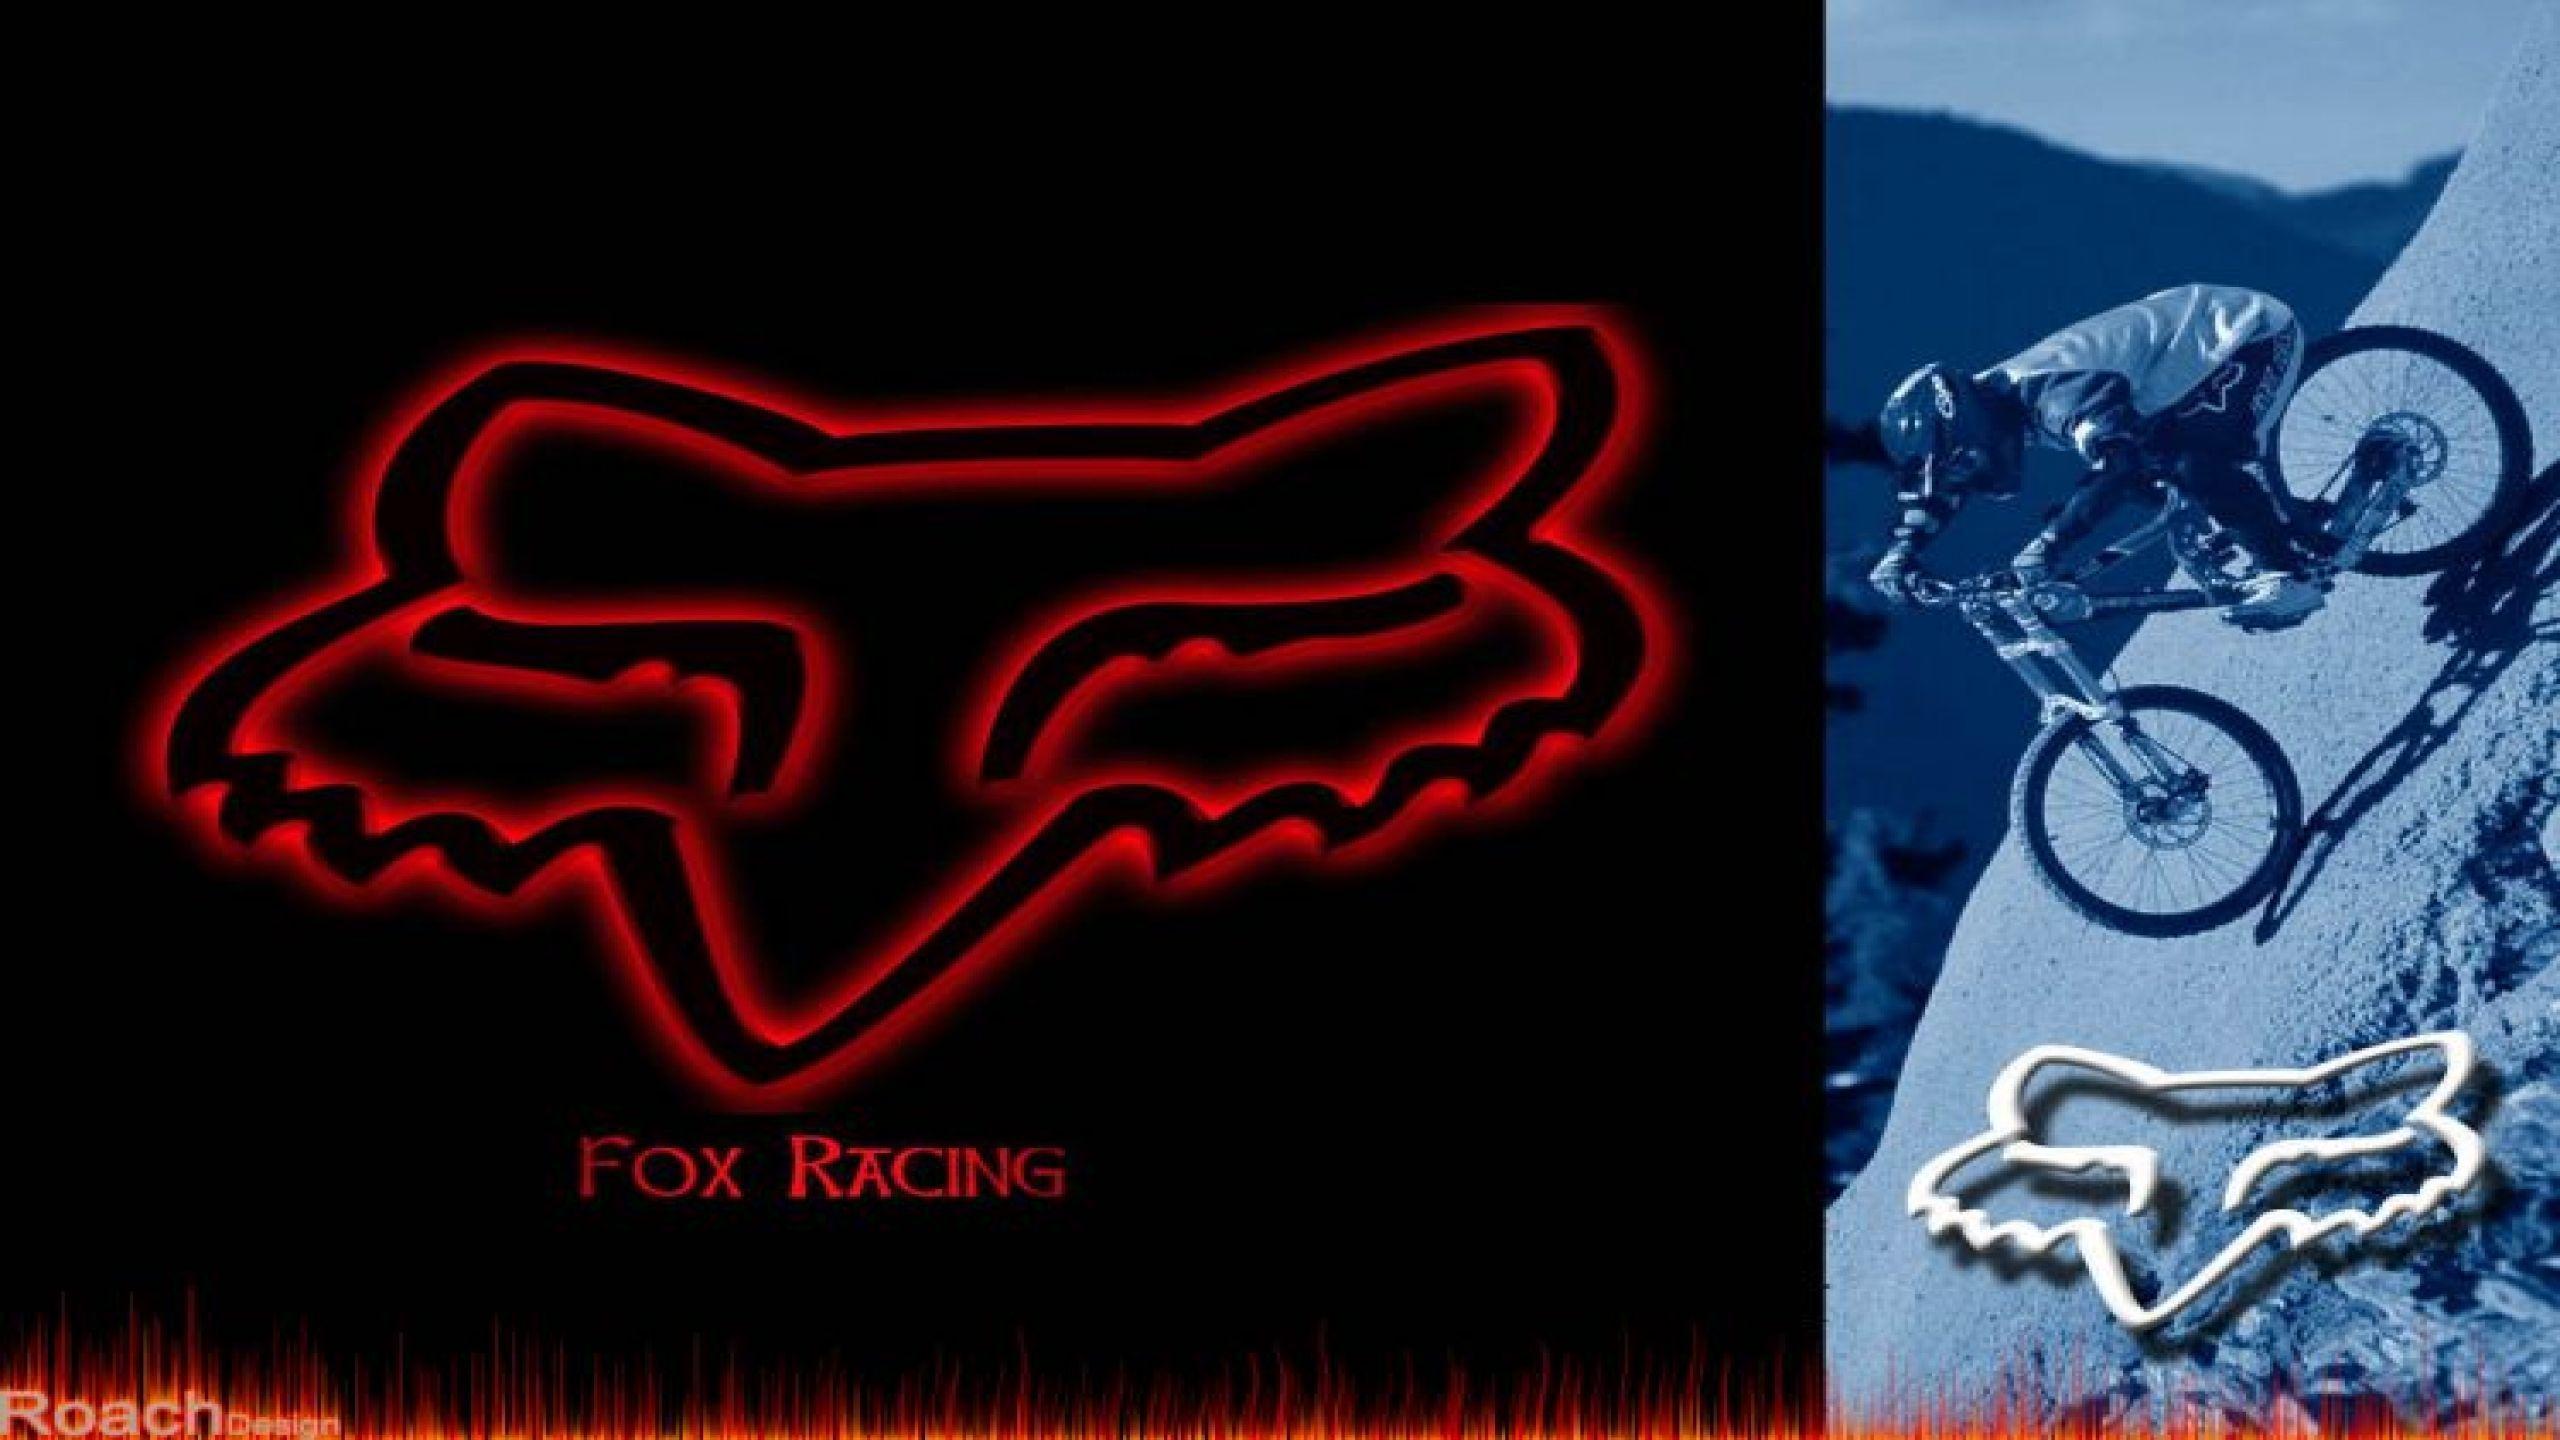 Download Pink Fox Racing Wallpaper Gallery 1378x844 Free